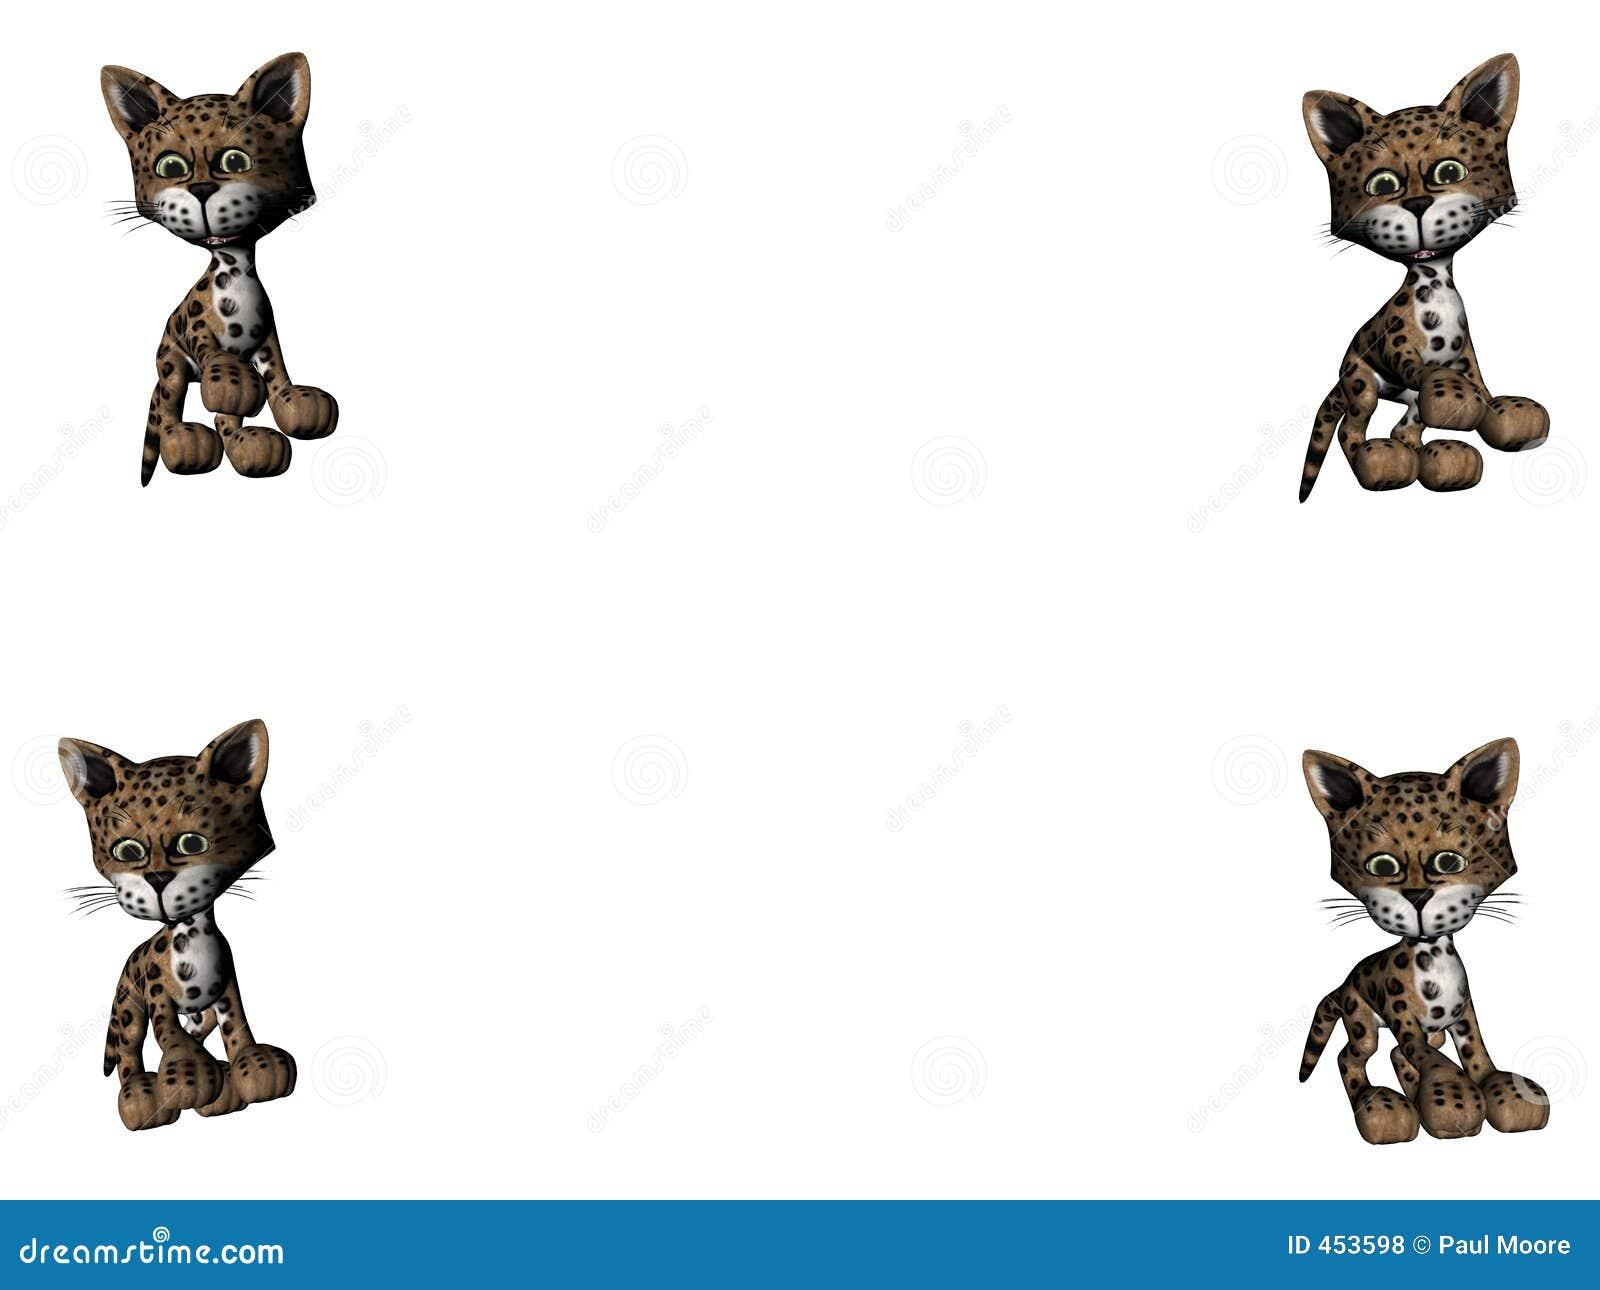 Download Leopard Kitties - Copy Space Stock Illustration - Illustration of animals, small: 453598